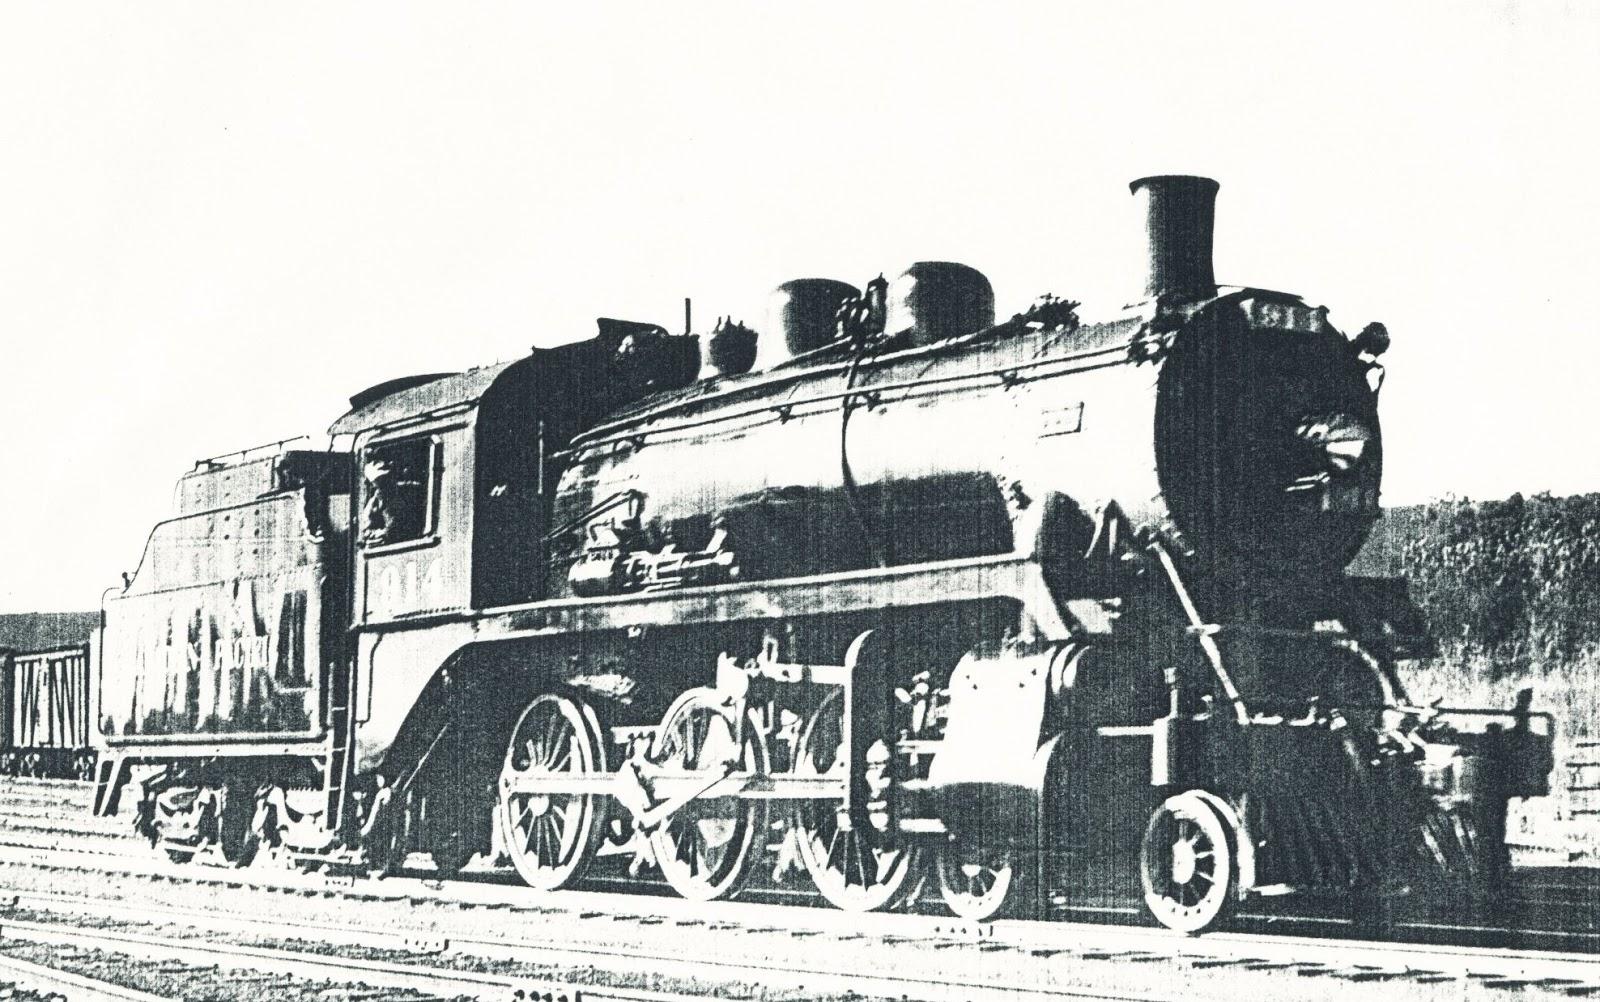 KETTLE VALLEY MODEL RAILWAY